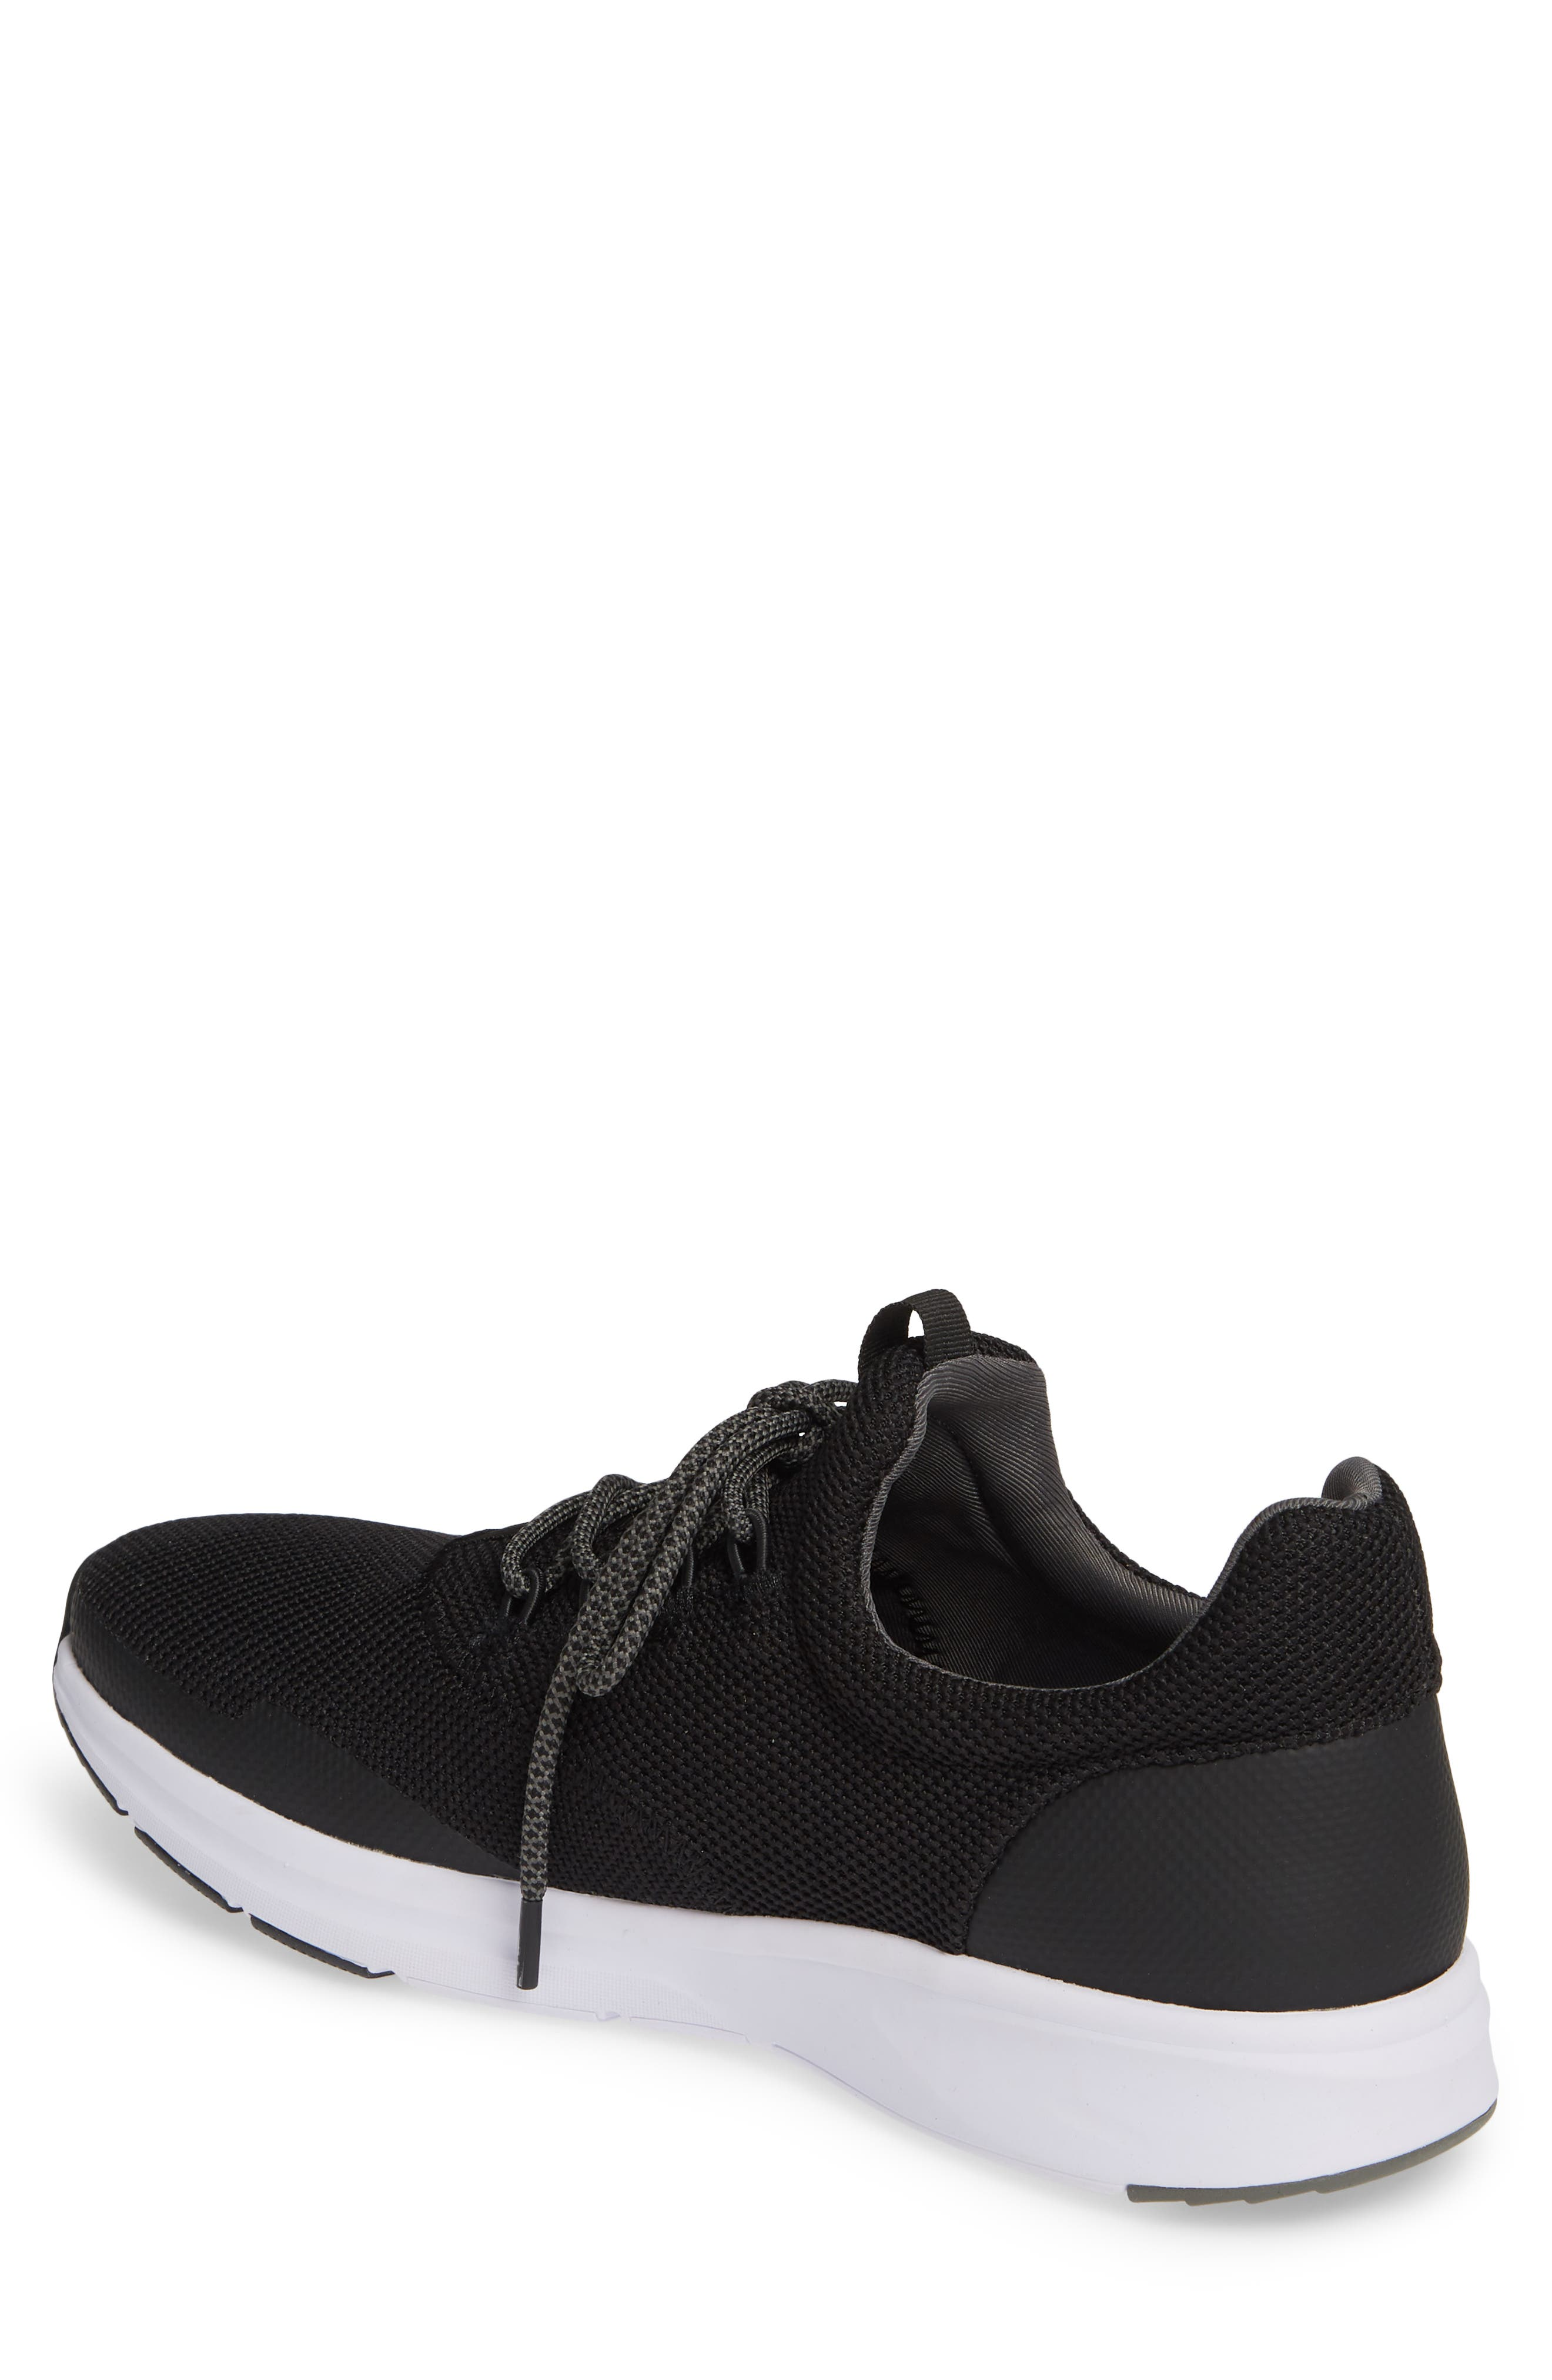 THE RAIL, Axel Sneaker, Alternate thumbnail 2, color, BLACK